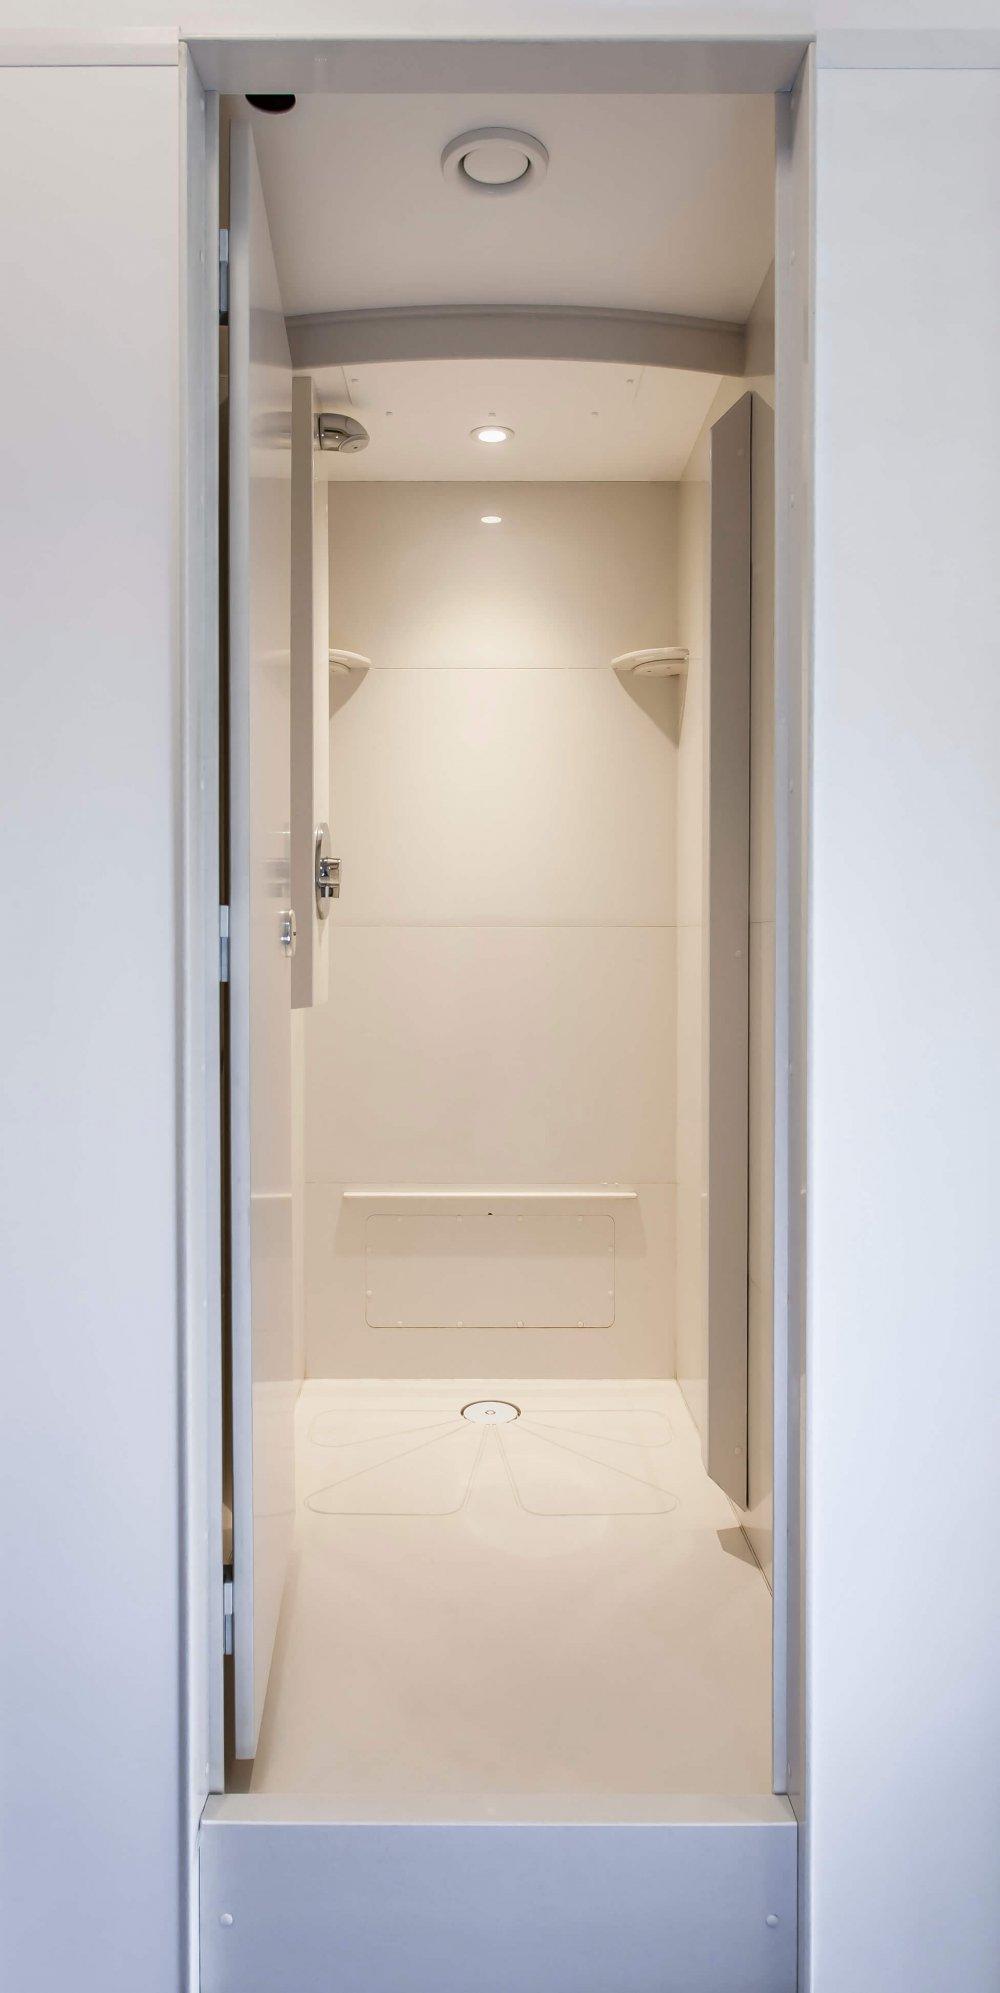 Lancing College_shower pods